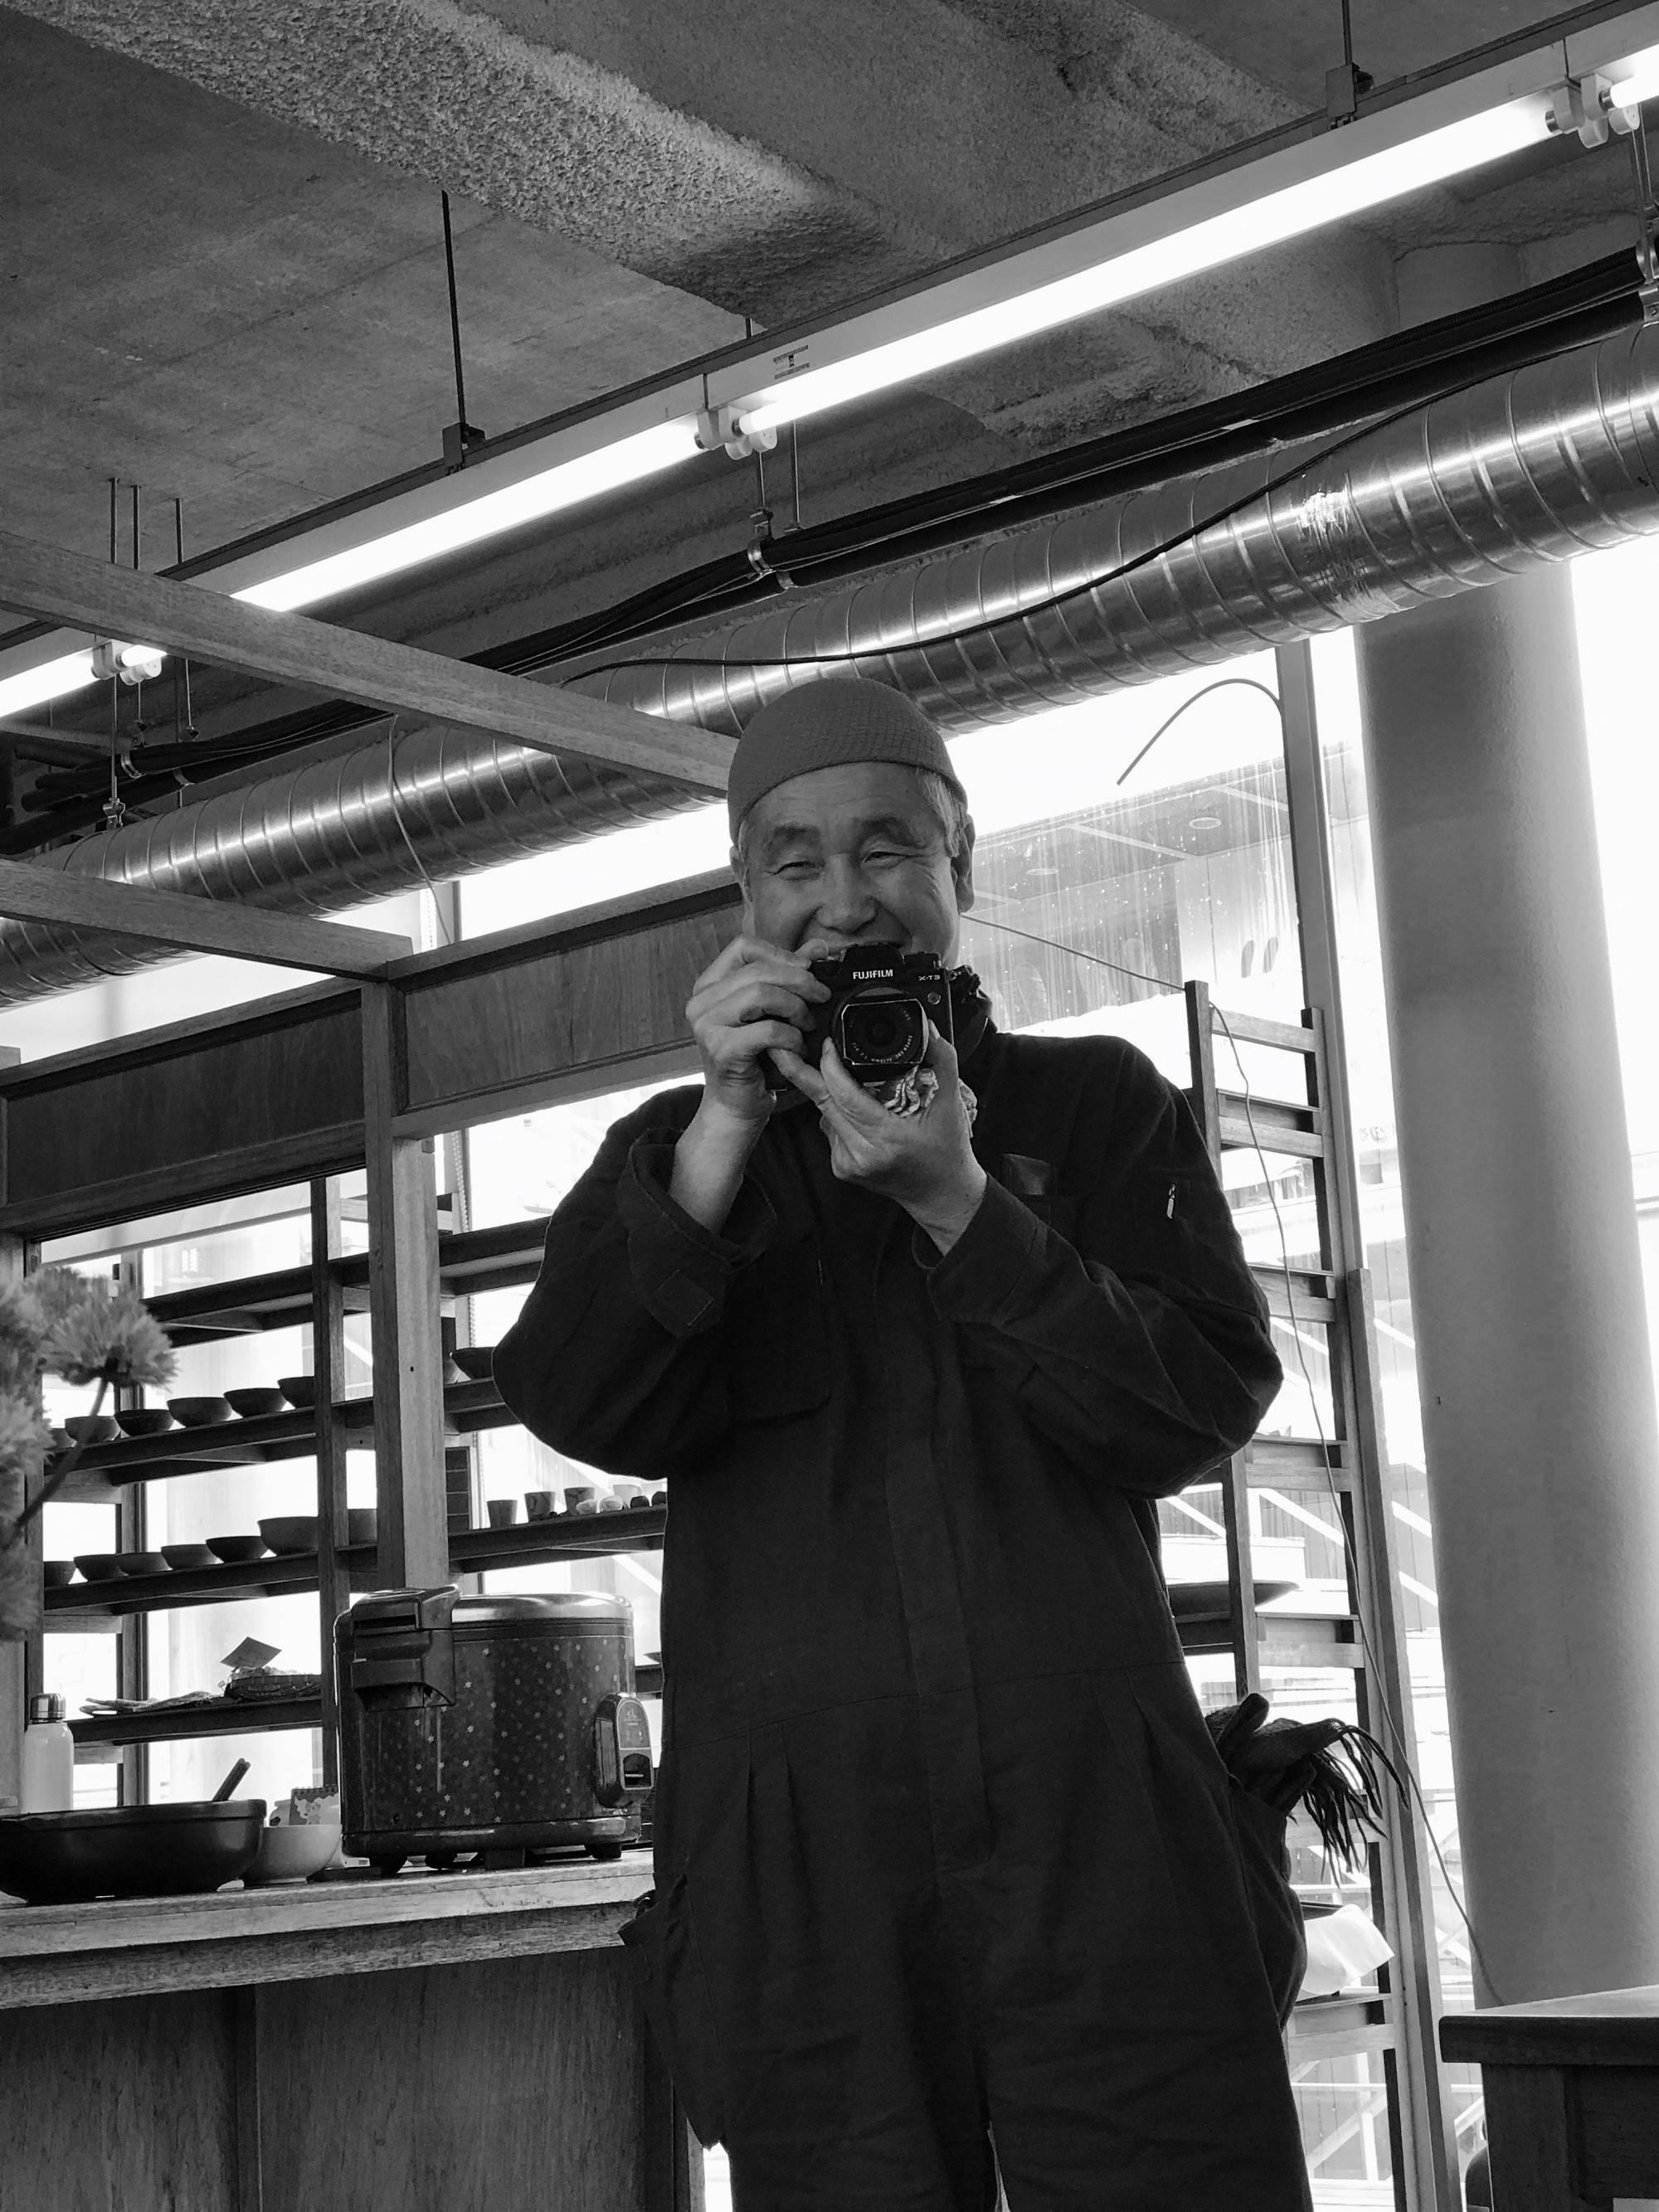 Ahn Sang-Soo, Designer / Artists / Director